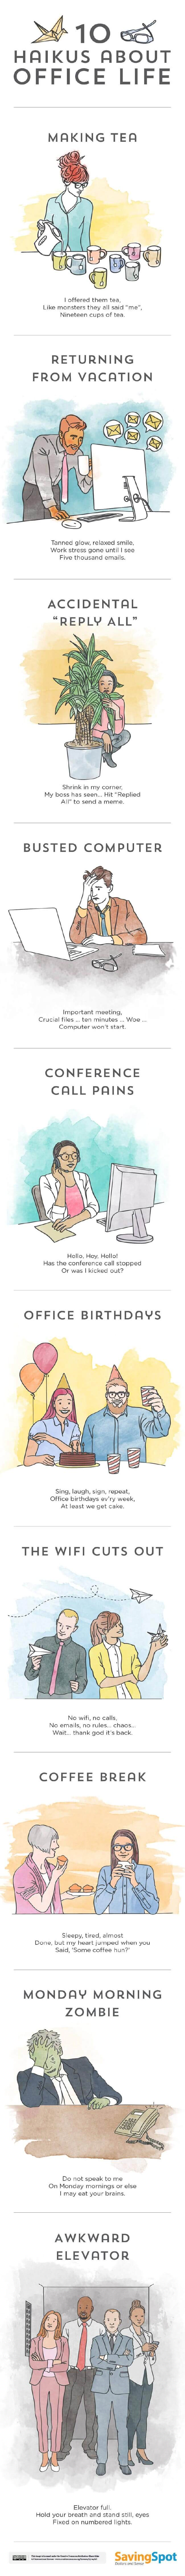 Image titled 10 haikus about office life